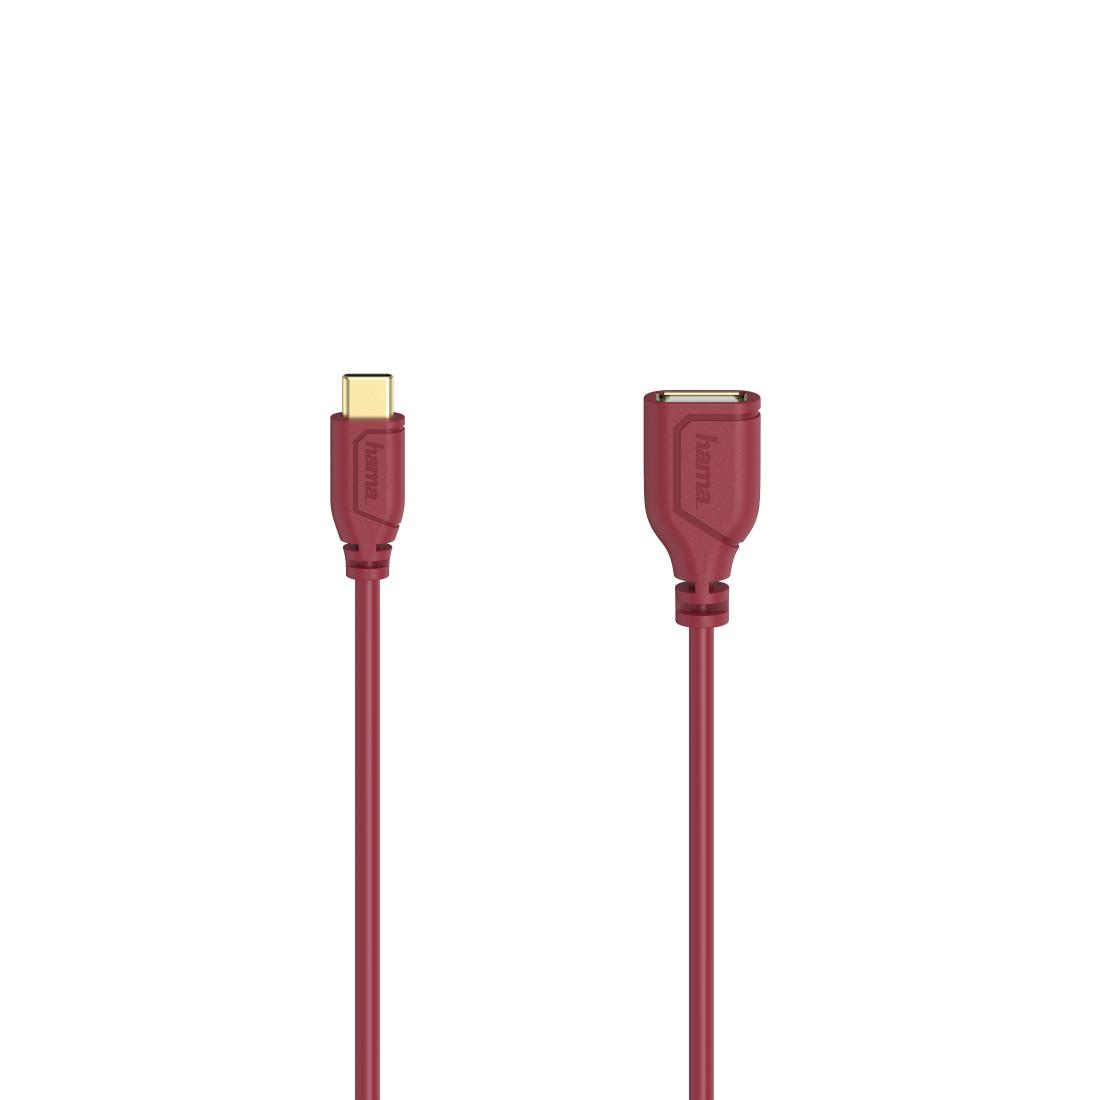 Адаптер HAMA Flexi-Slim, USB-C мъжко - USB 2.0 женско, OTG, 0.15 м., Позлатени конектори, Червен